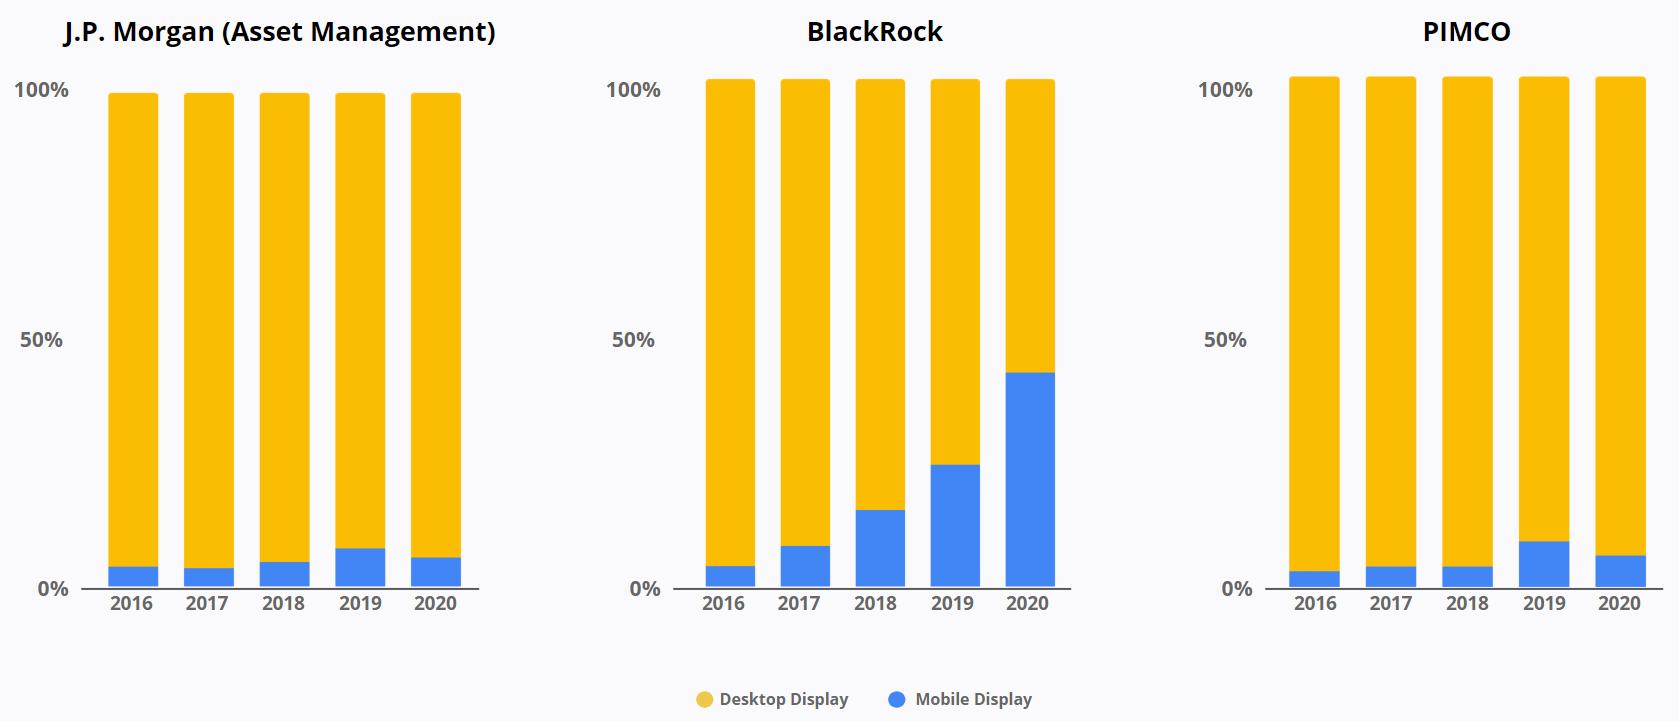 Desktop Display Ads Share - J.P. Morgan - Blackrock - PIMCO